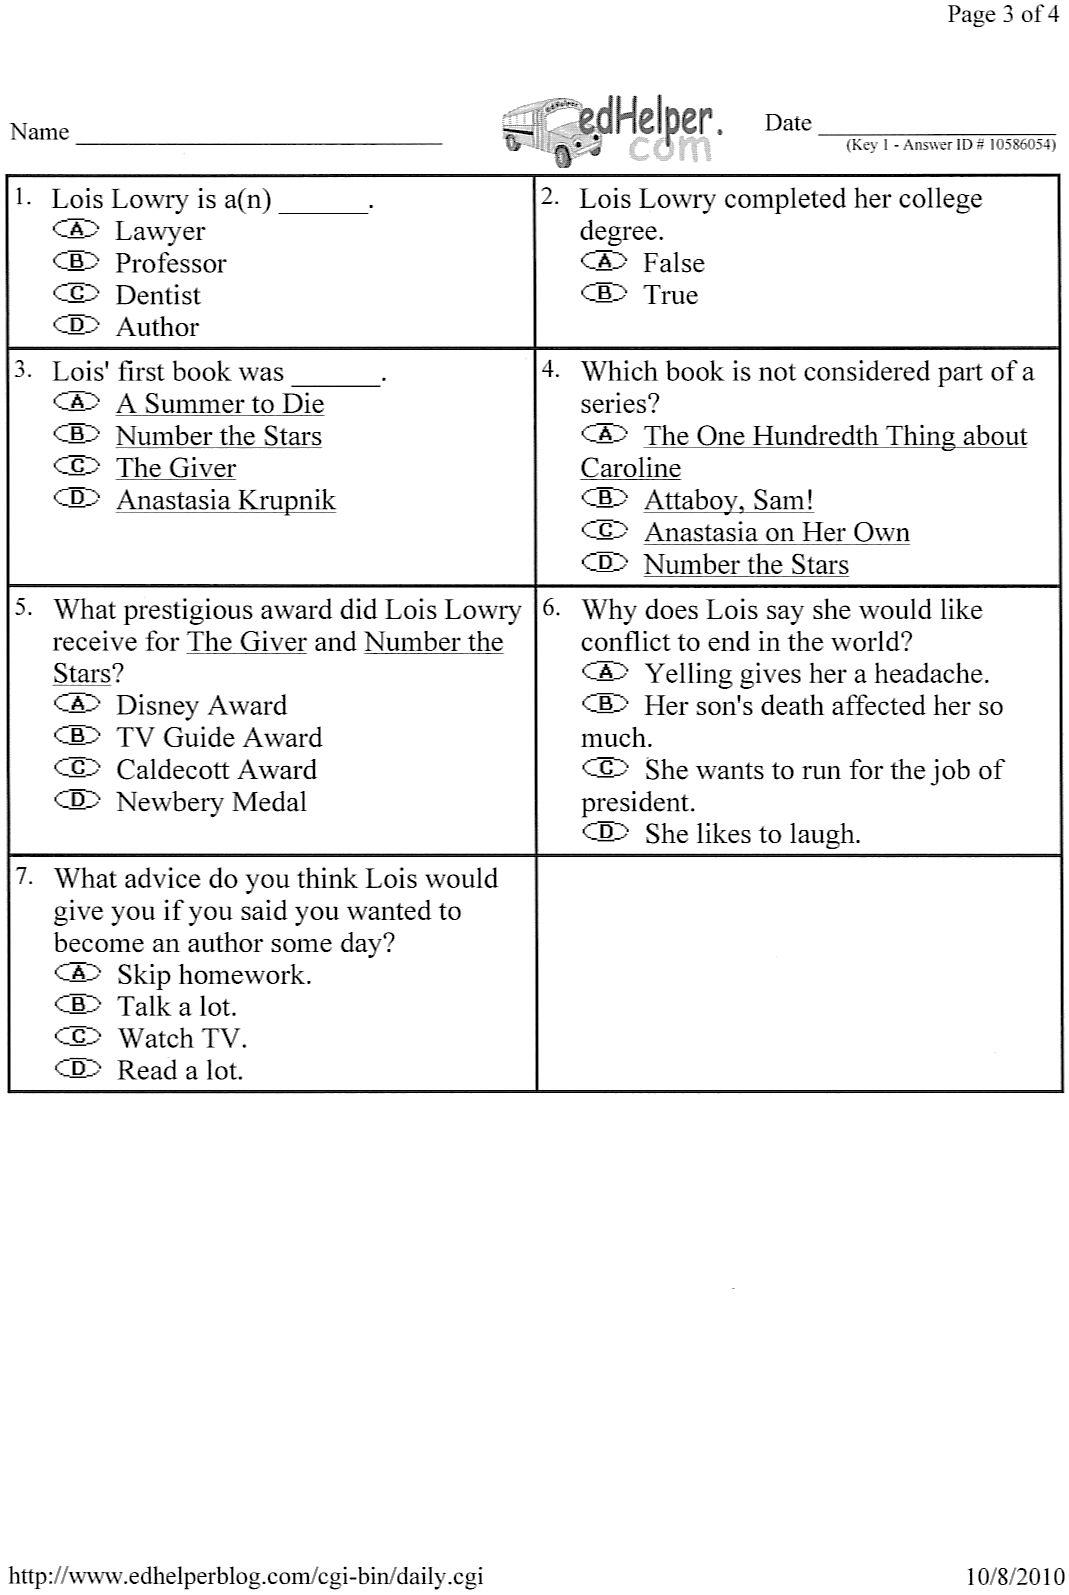 Mrs Hammerberg S Reading Class 4th Grade Homework Due 10 15